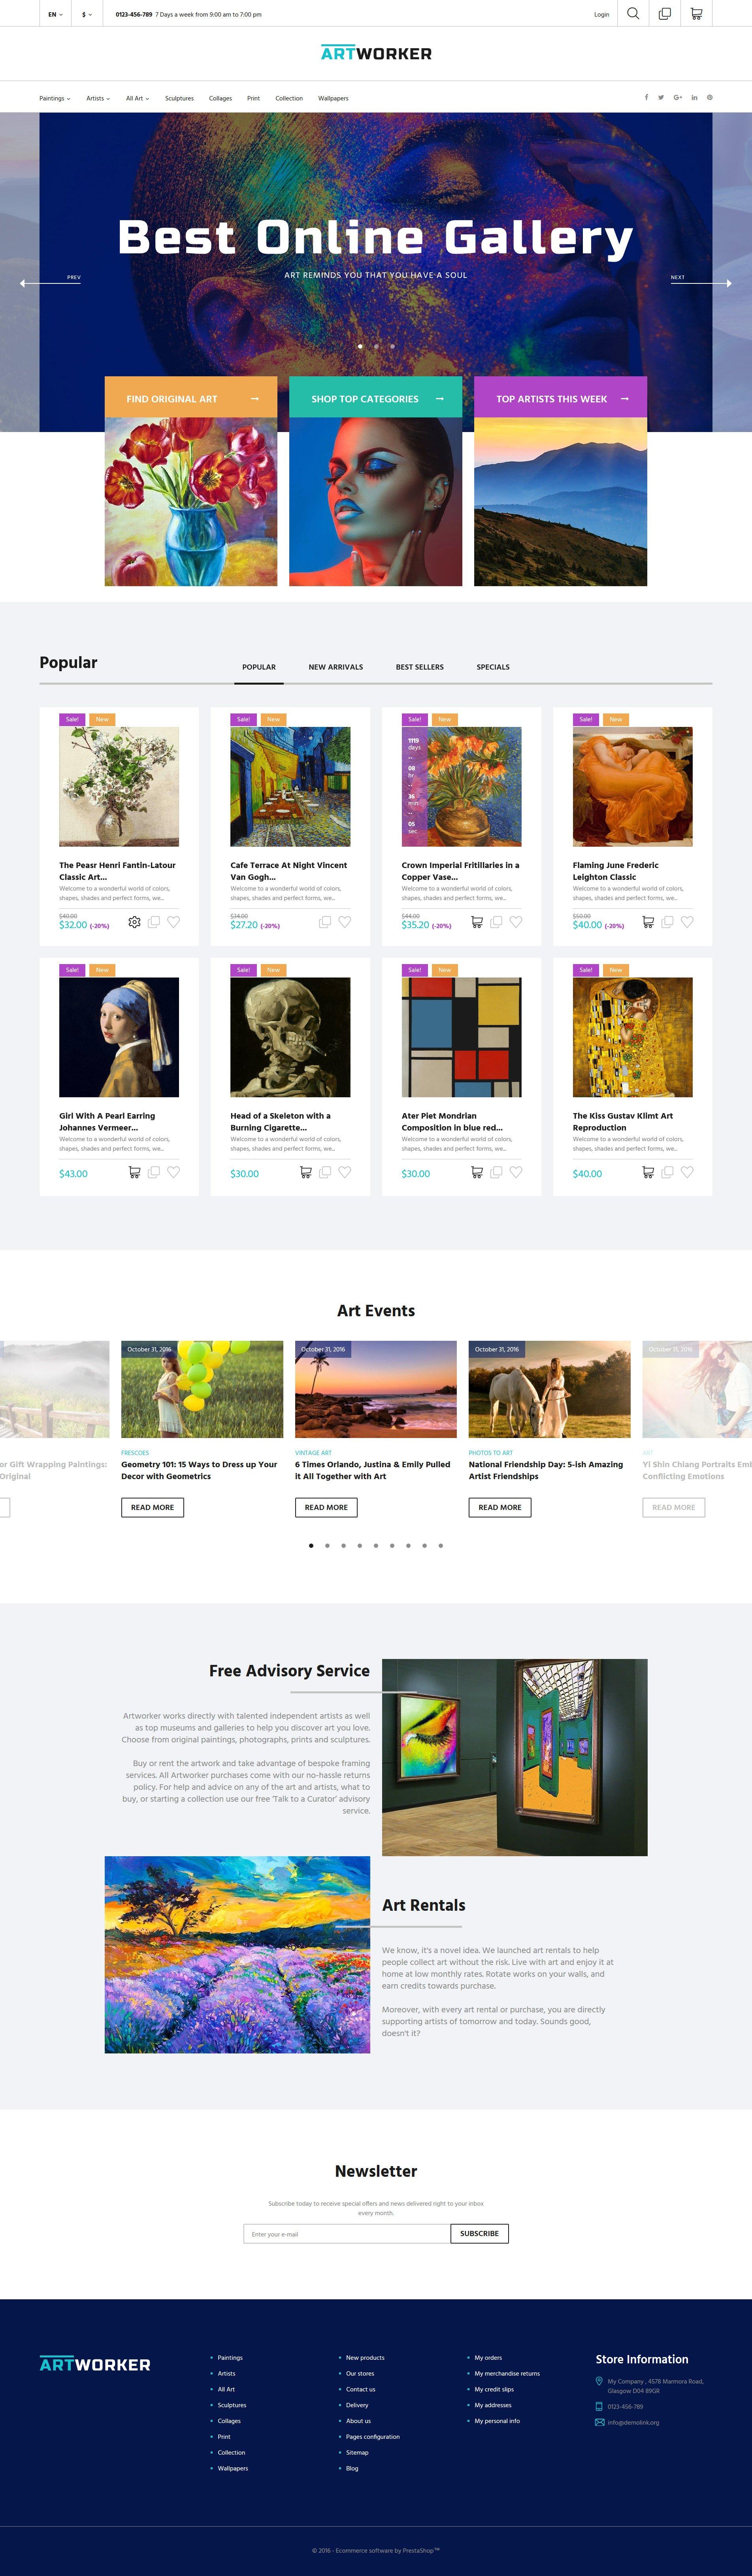 """Artworker - Galerie et portfolio d'artiste en ligne"" thème PrestaShop adaptatif #62011"